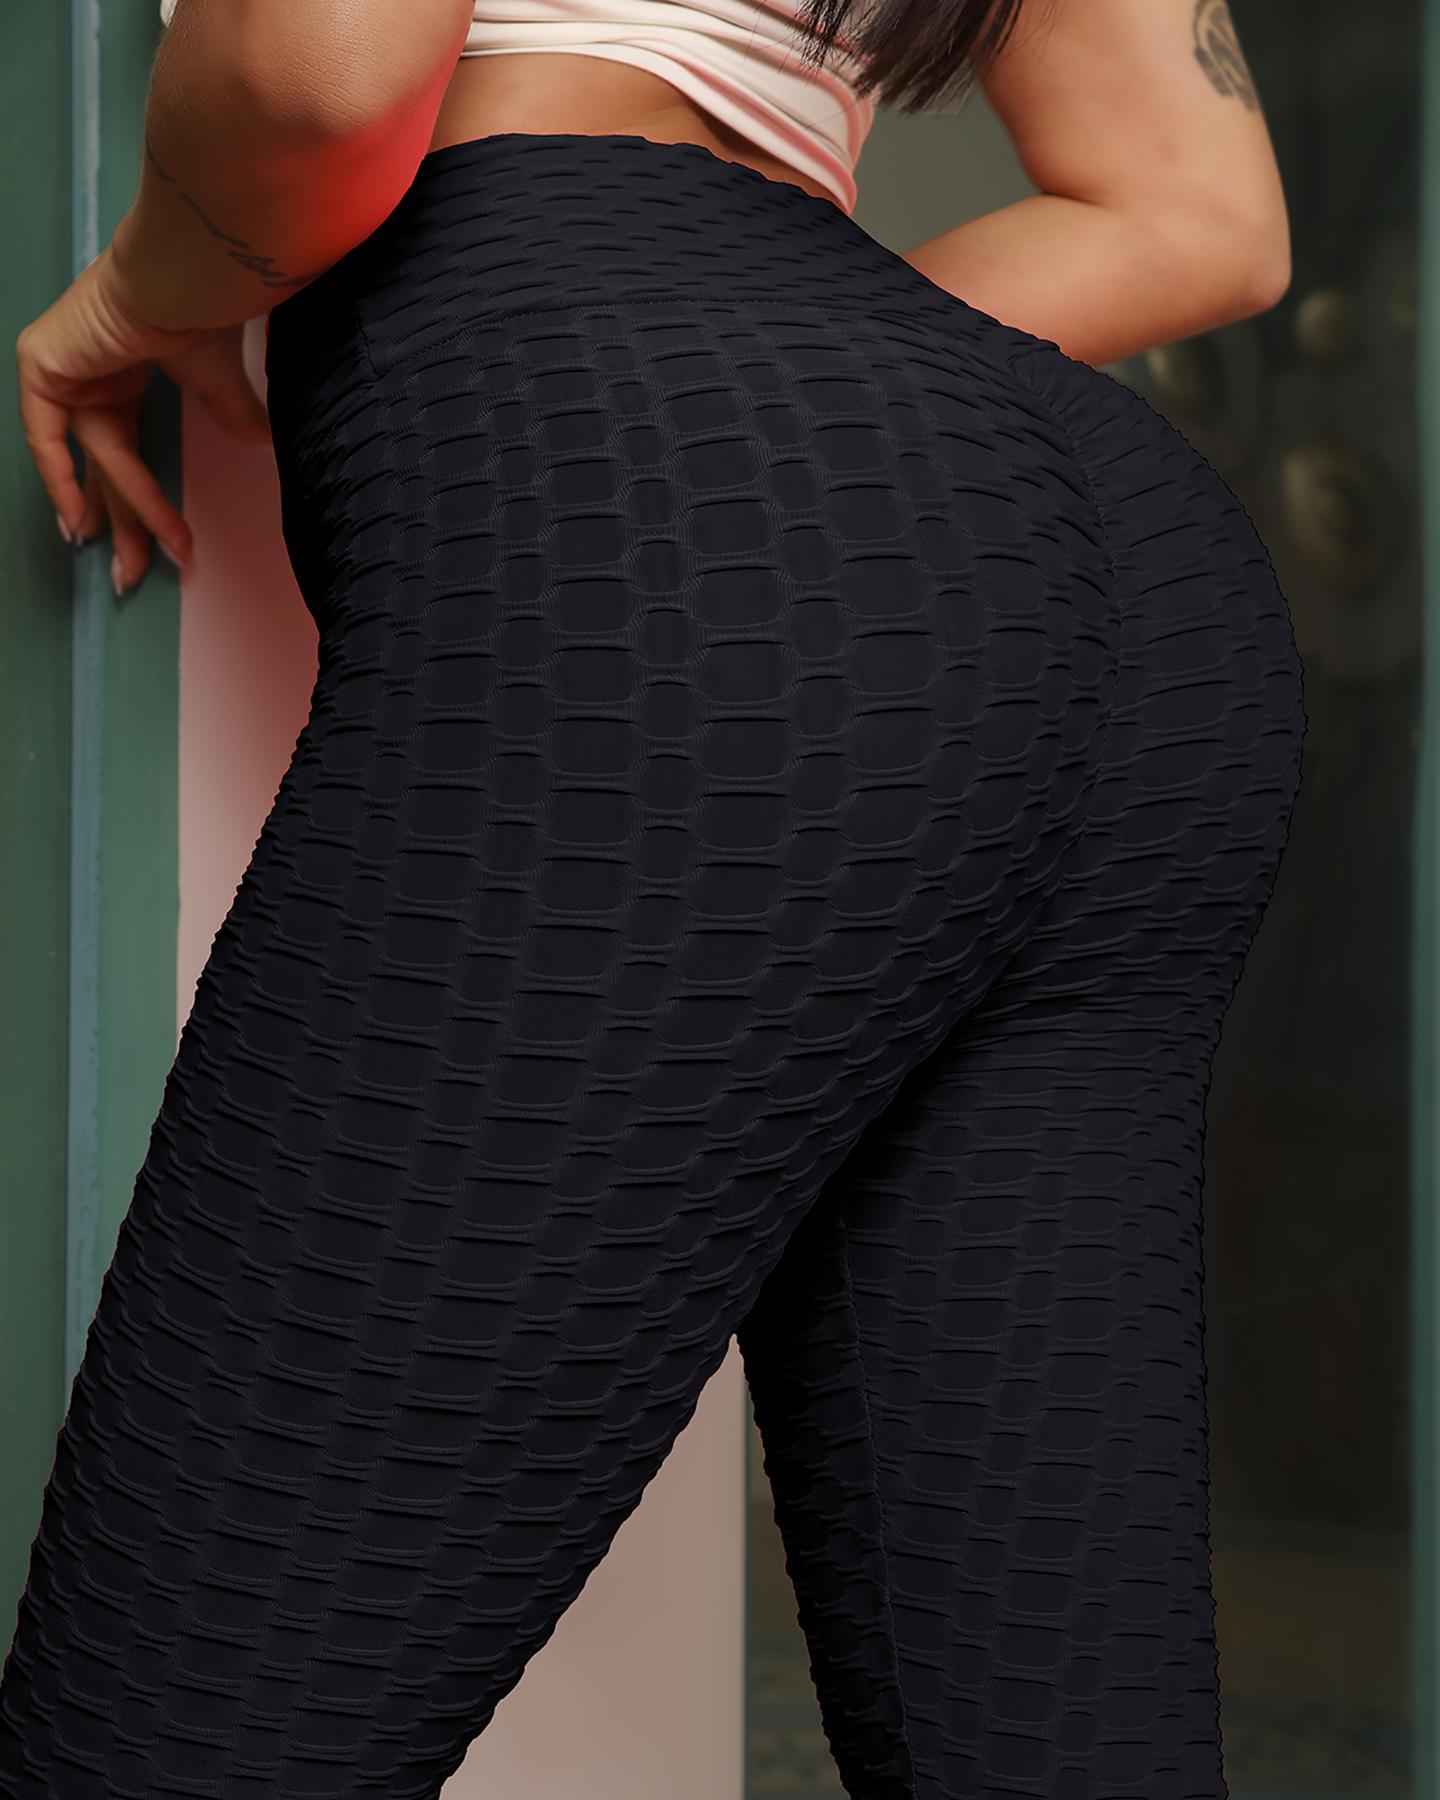 Bubble Textured High Waist Yoga Pants Tummy Control Slimming Booty Leggings thumbnail